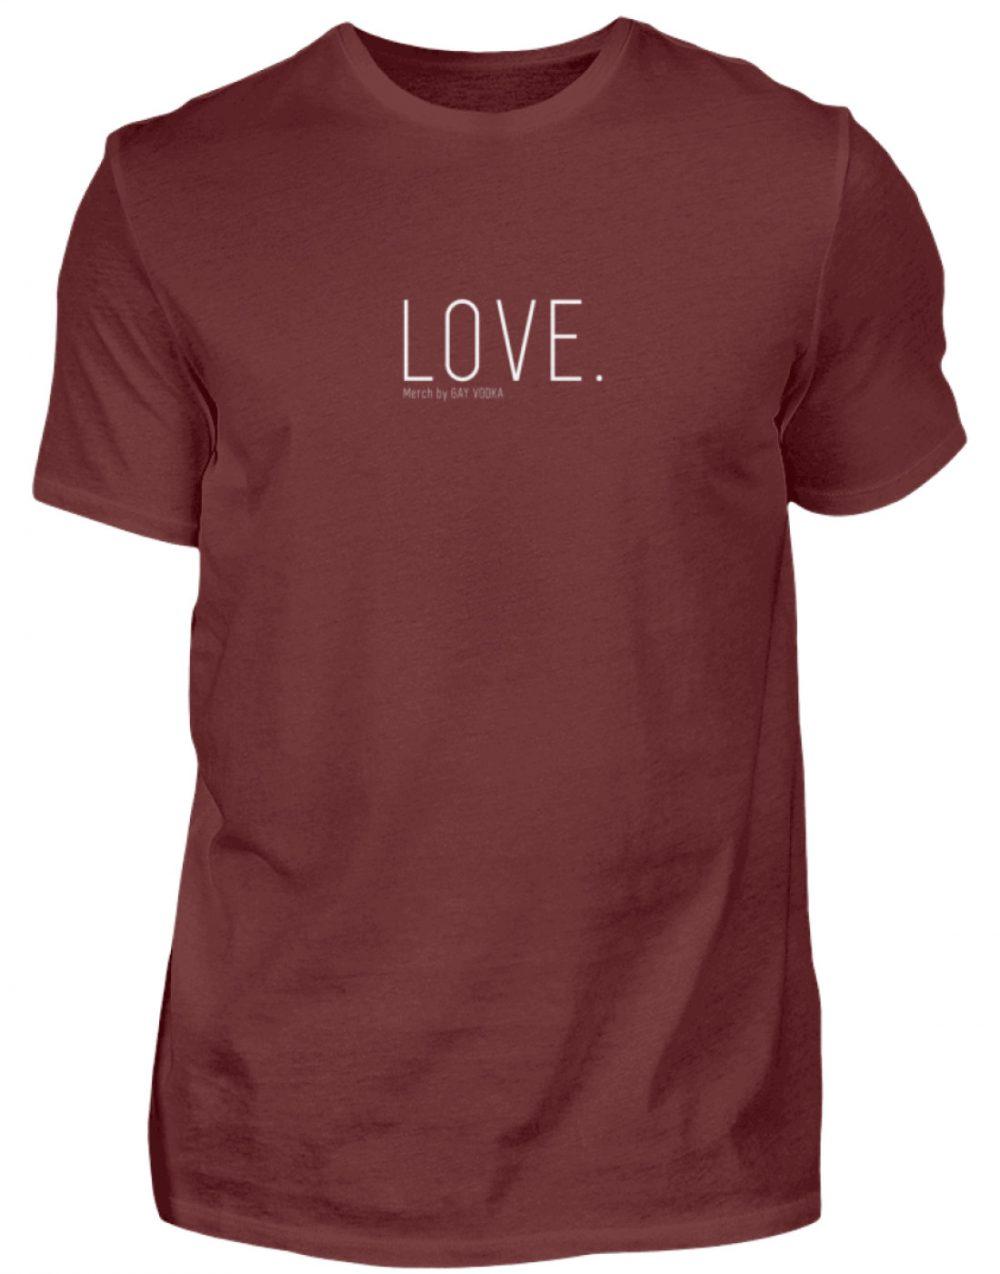 LOVE. - Herren Premiumshirt-3192